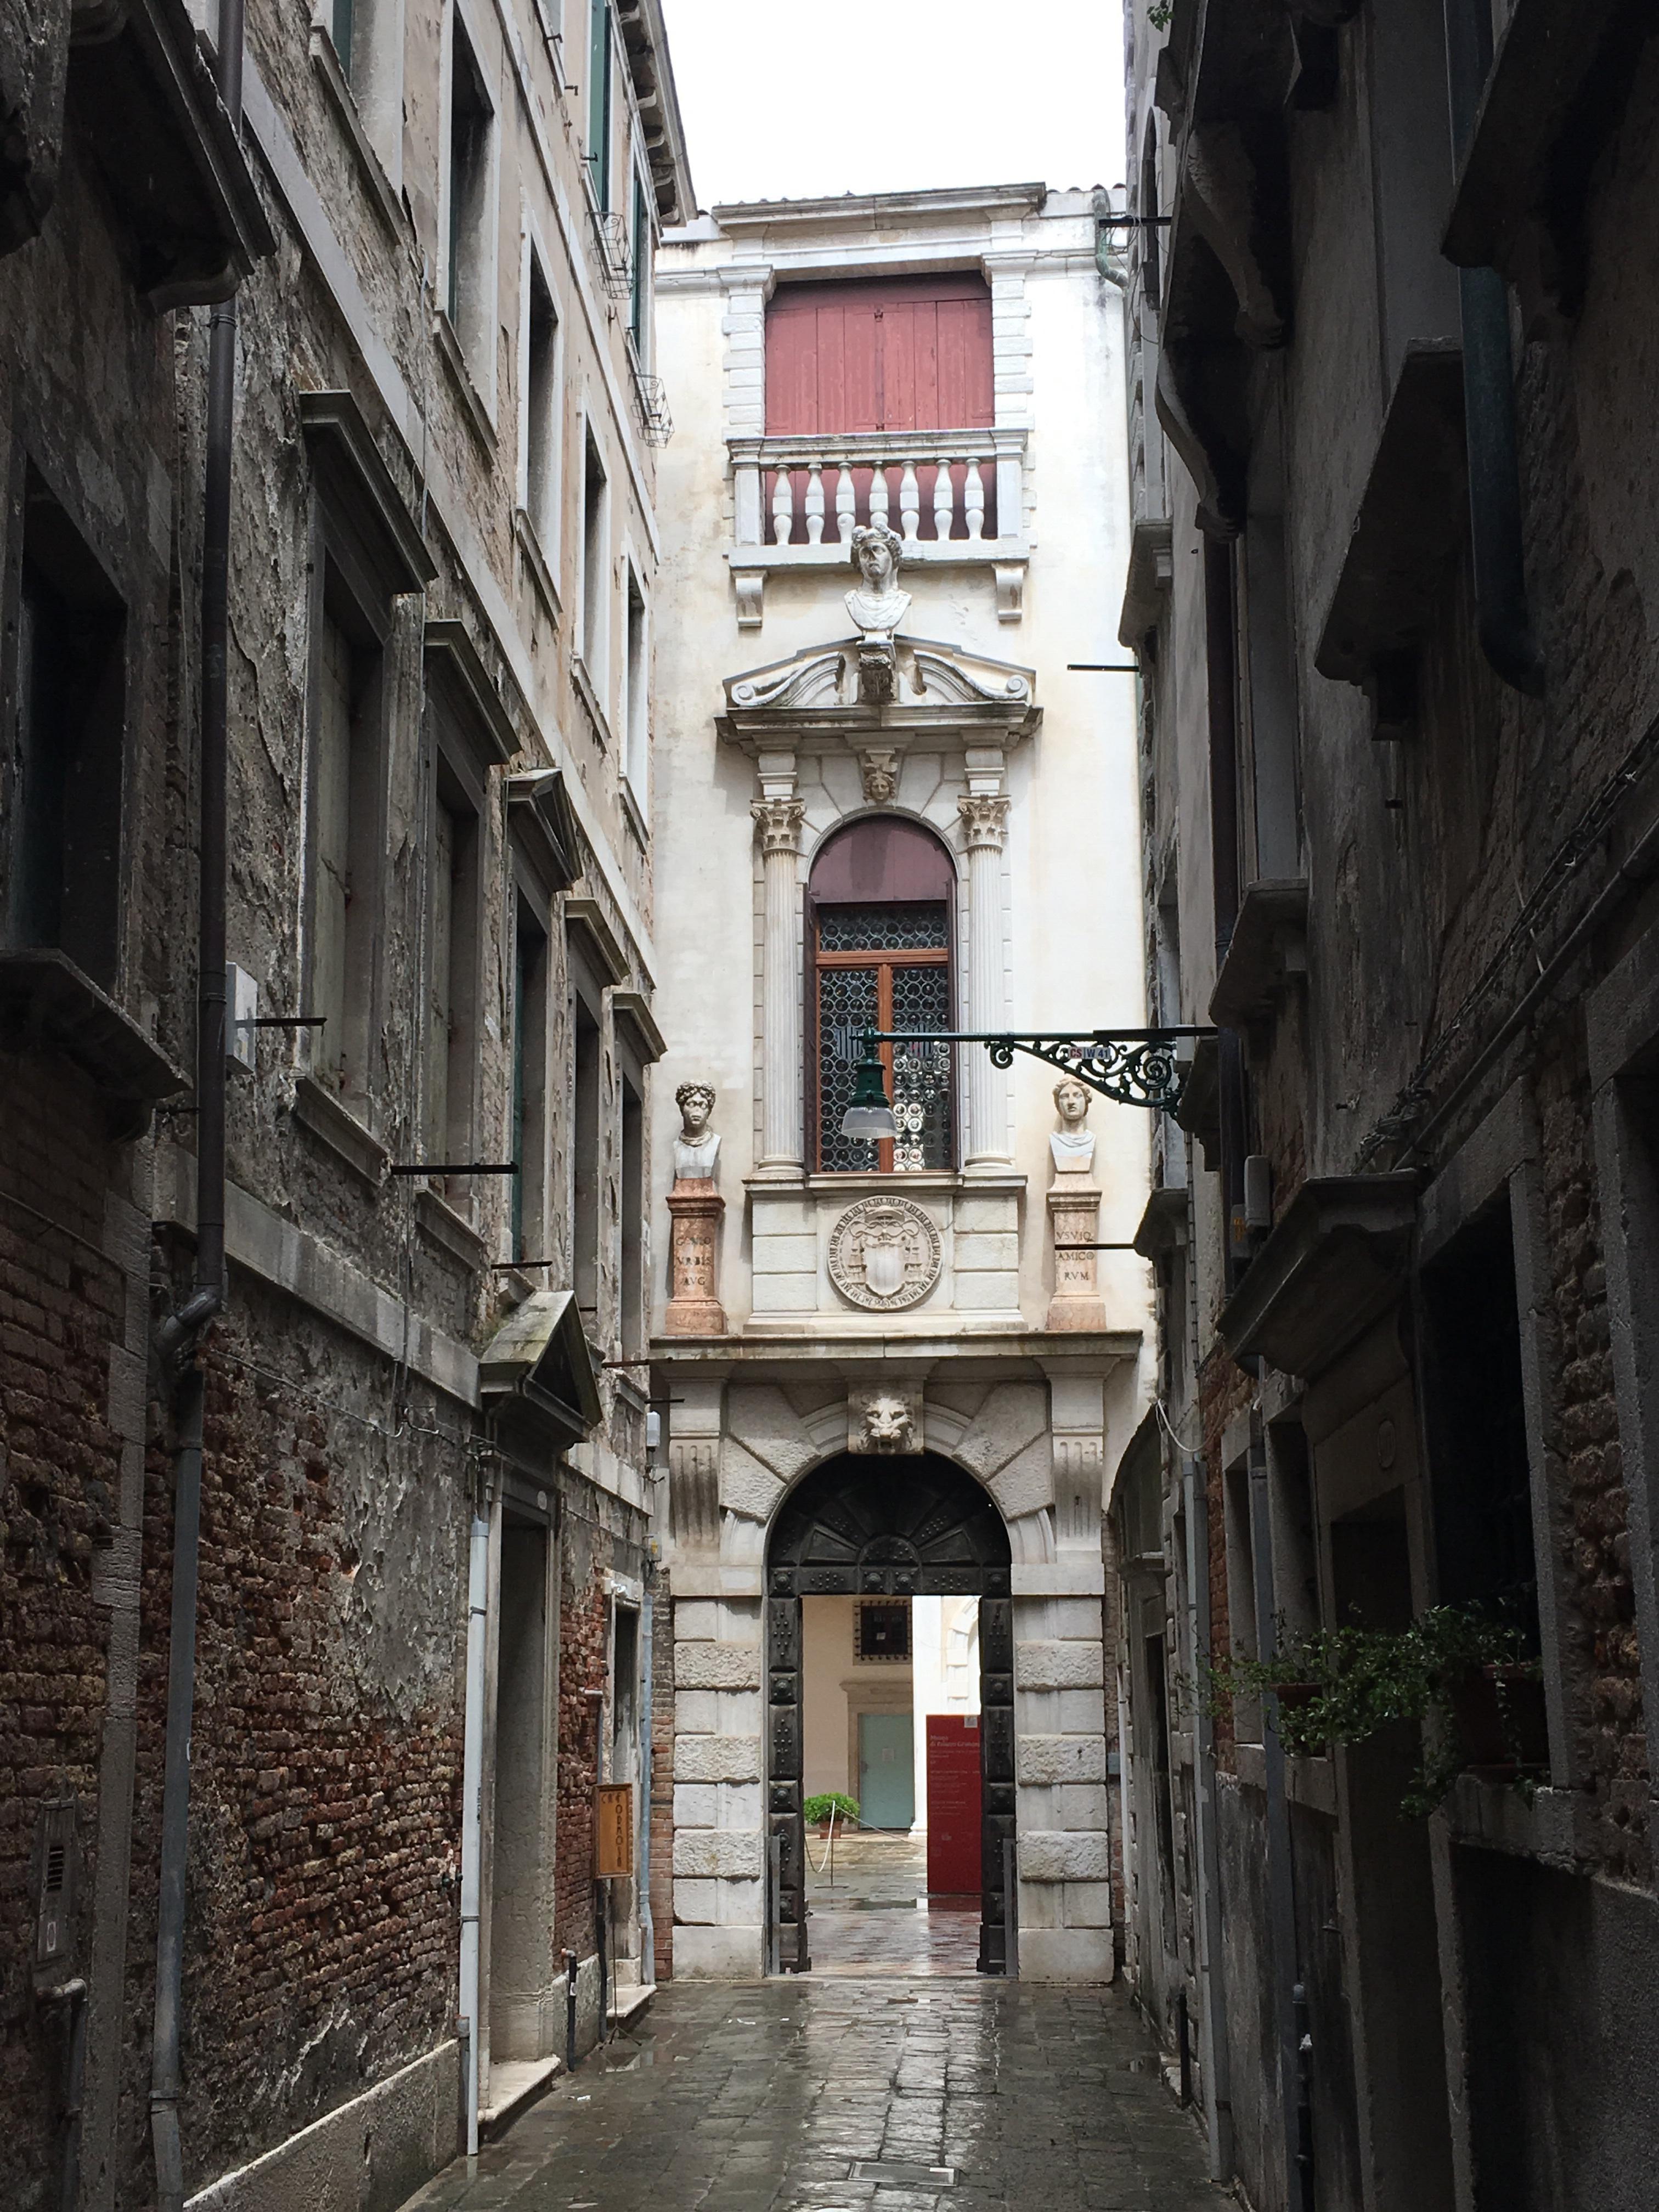 Palazzo Grimani - entrance from Campo Santa Maria Formosa, Venezia